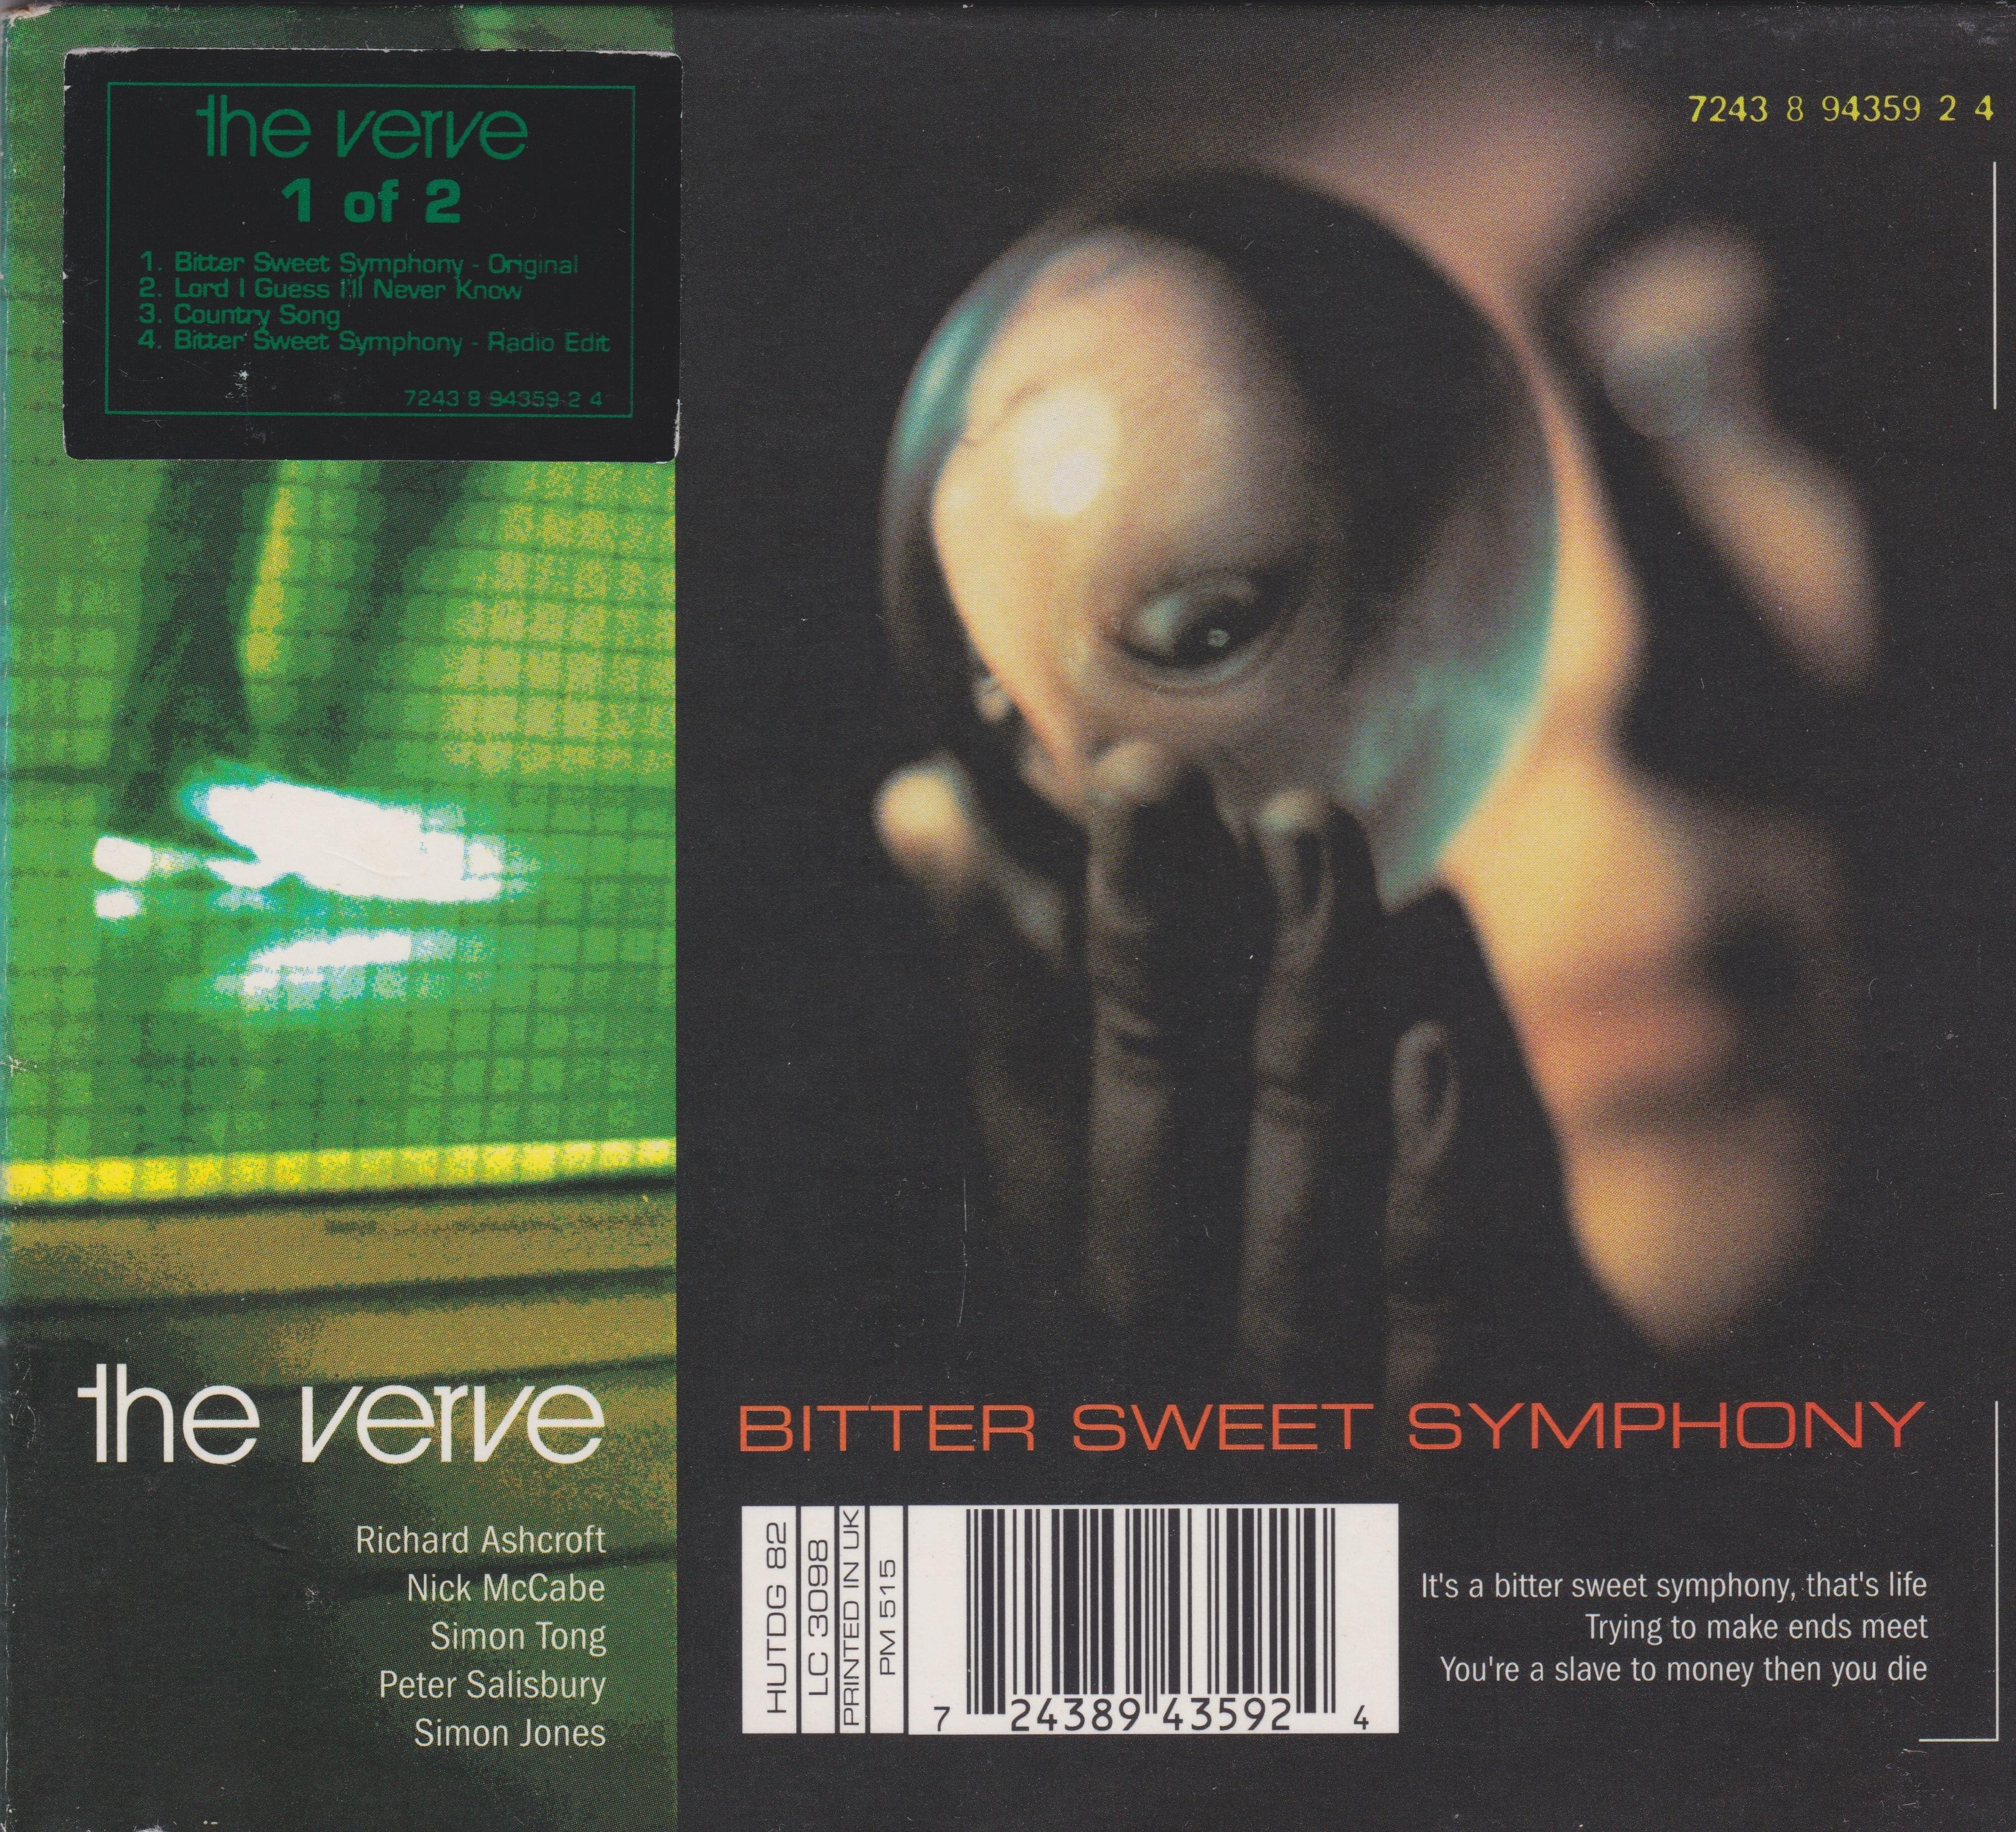 The Verve Bitter Sweet Symphony single artwork